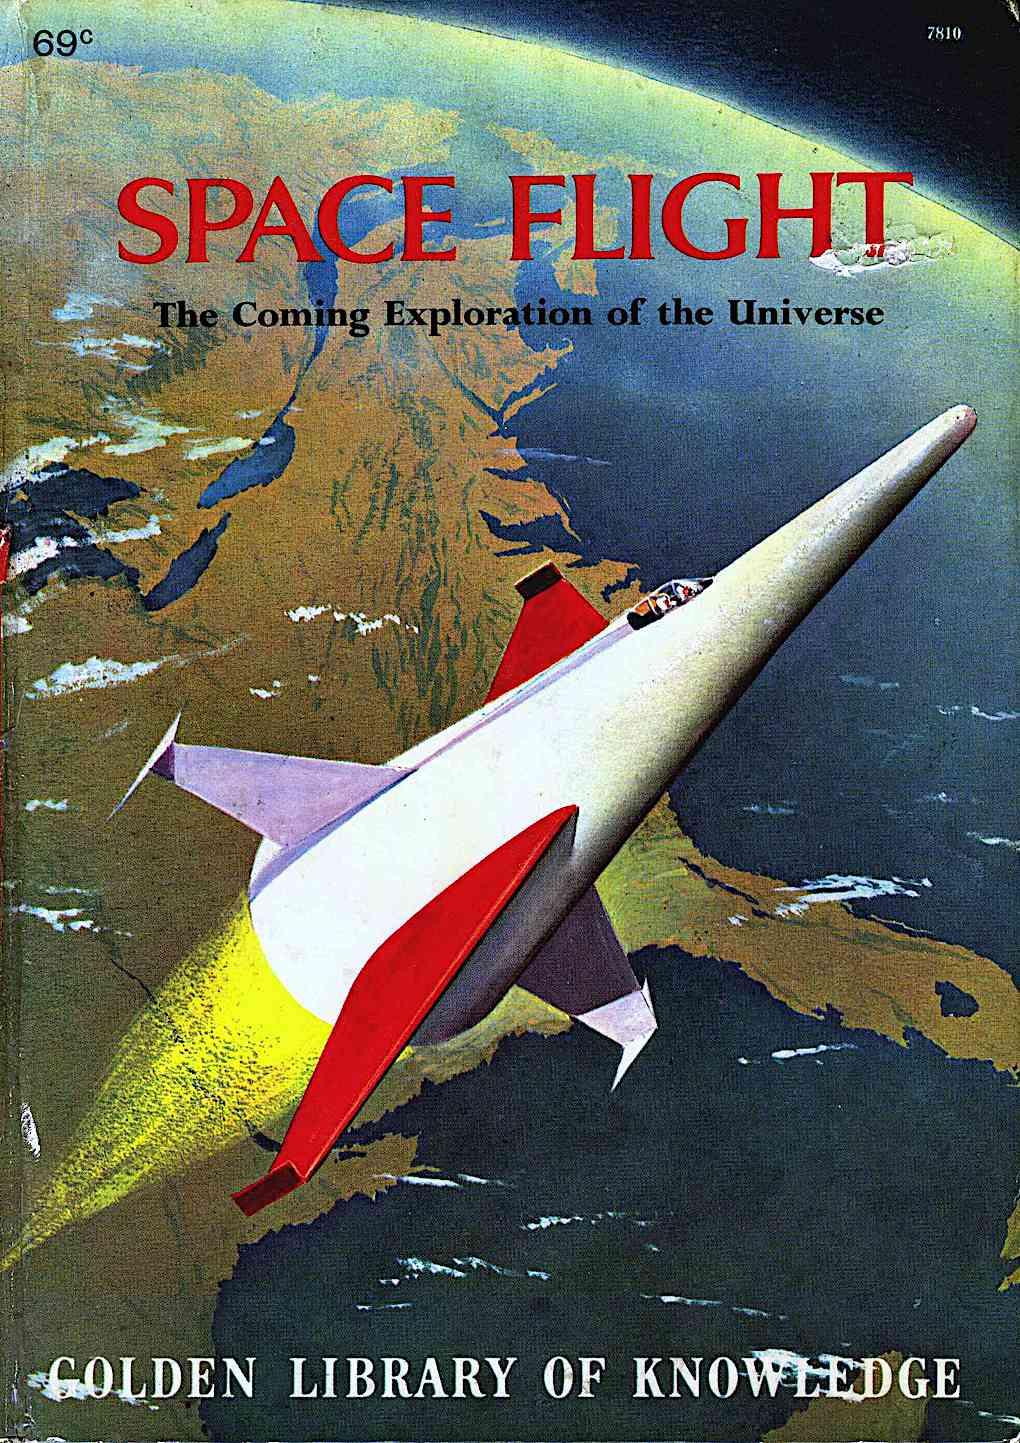 John Polgreen Space Flight, cover illustration of a weird rocket leaving Earth